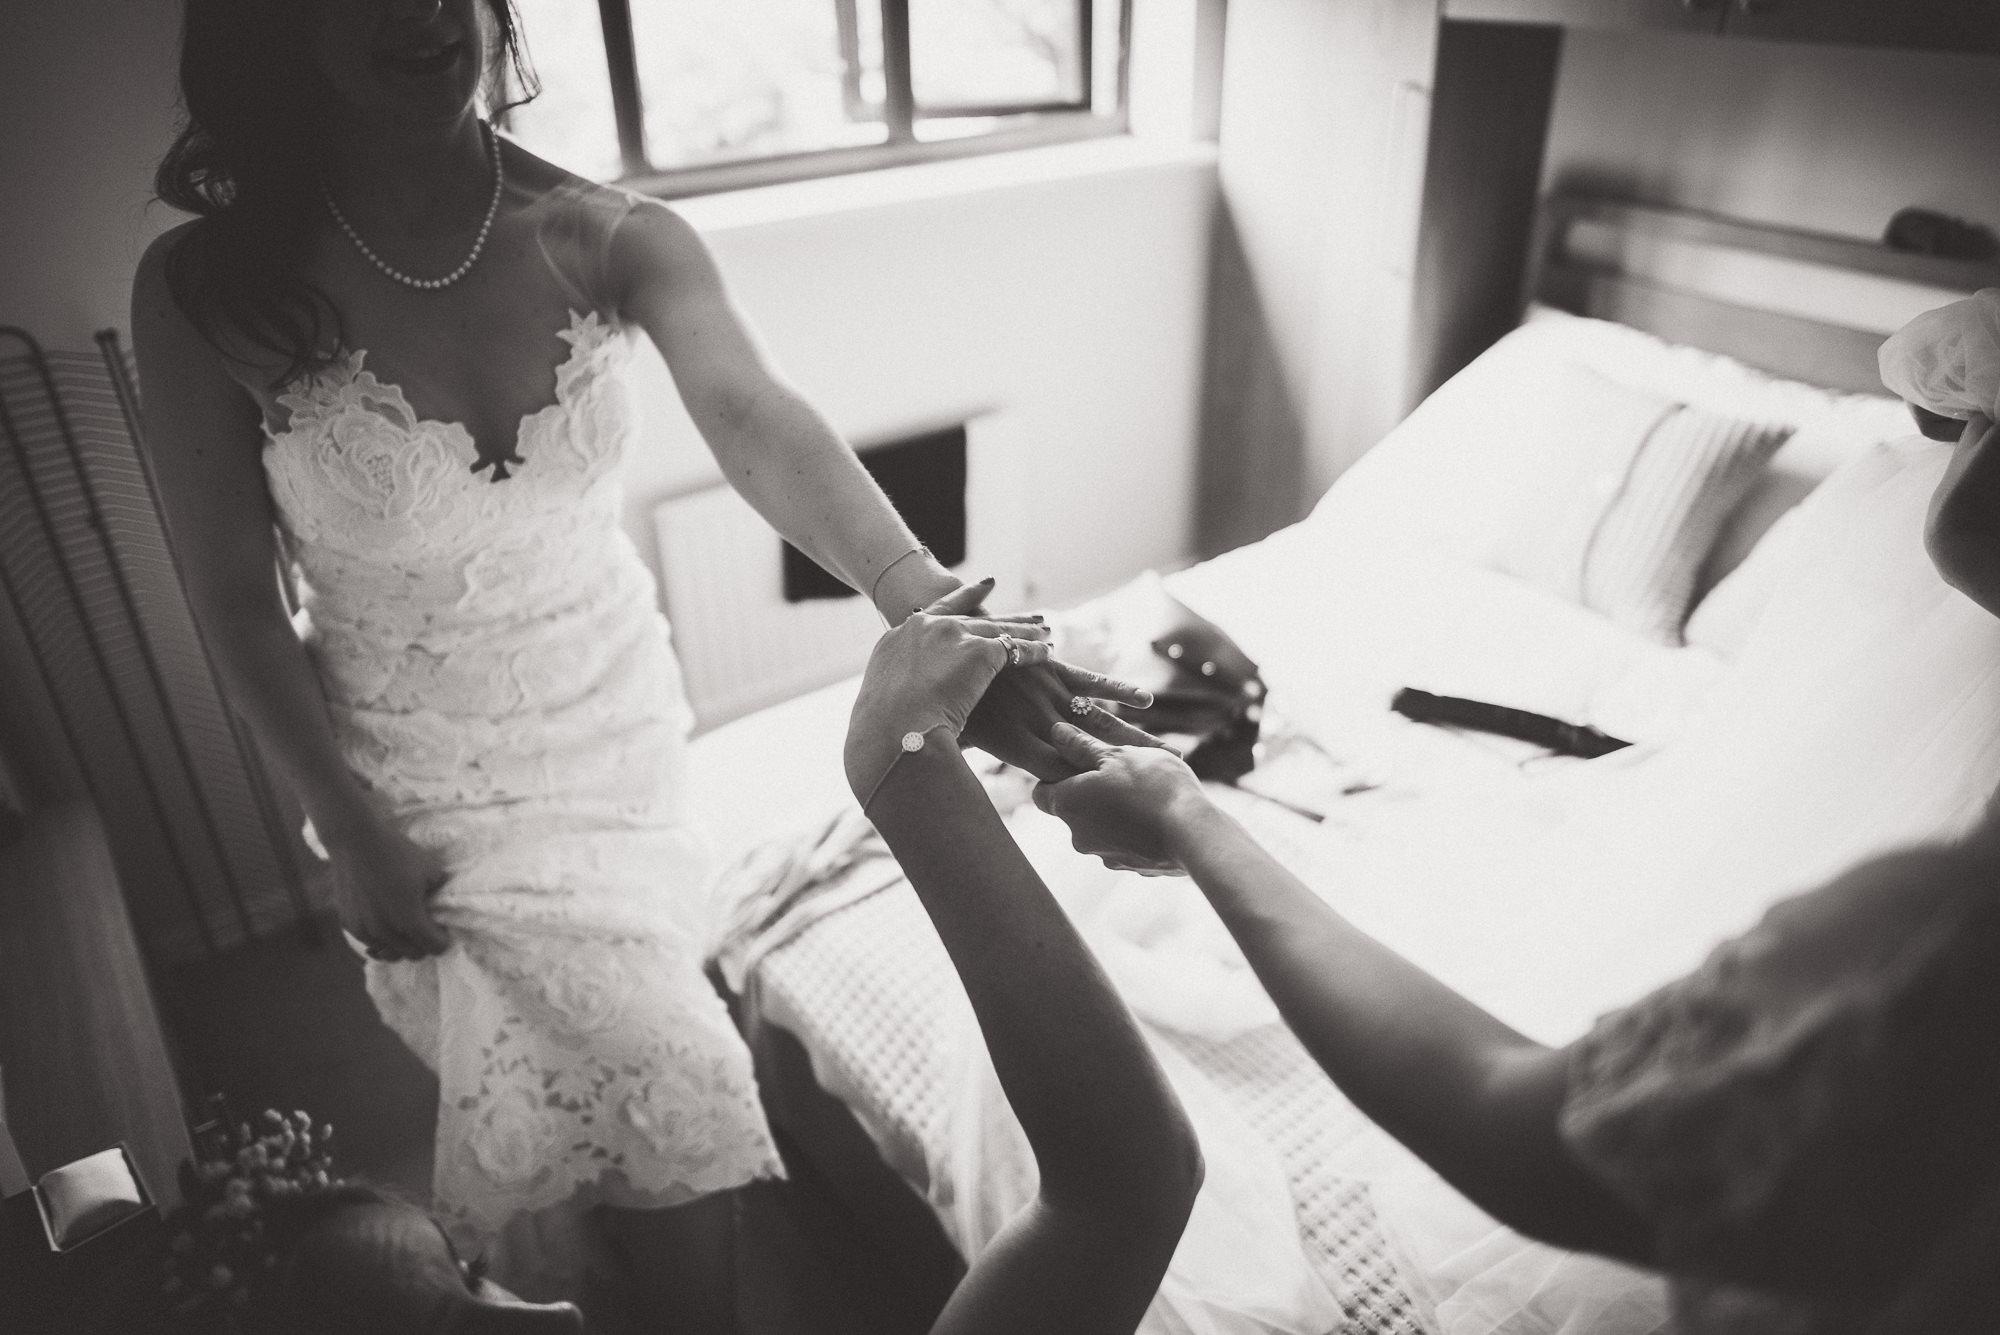 Veils & Bales Wedding Photography | Charlie & Steve SCSS 048